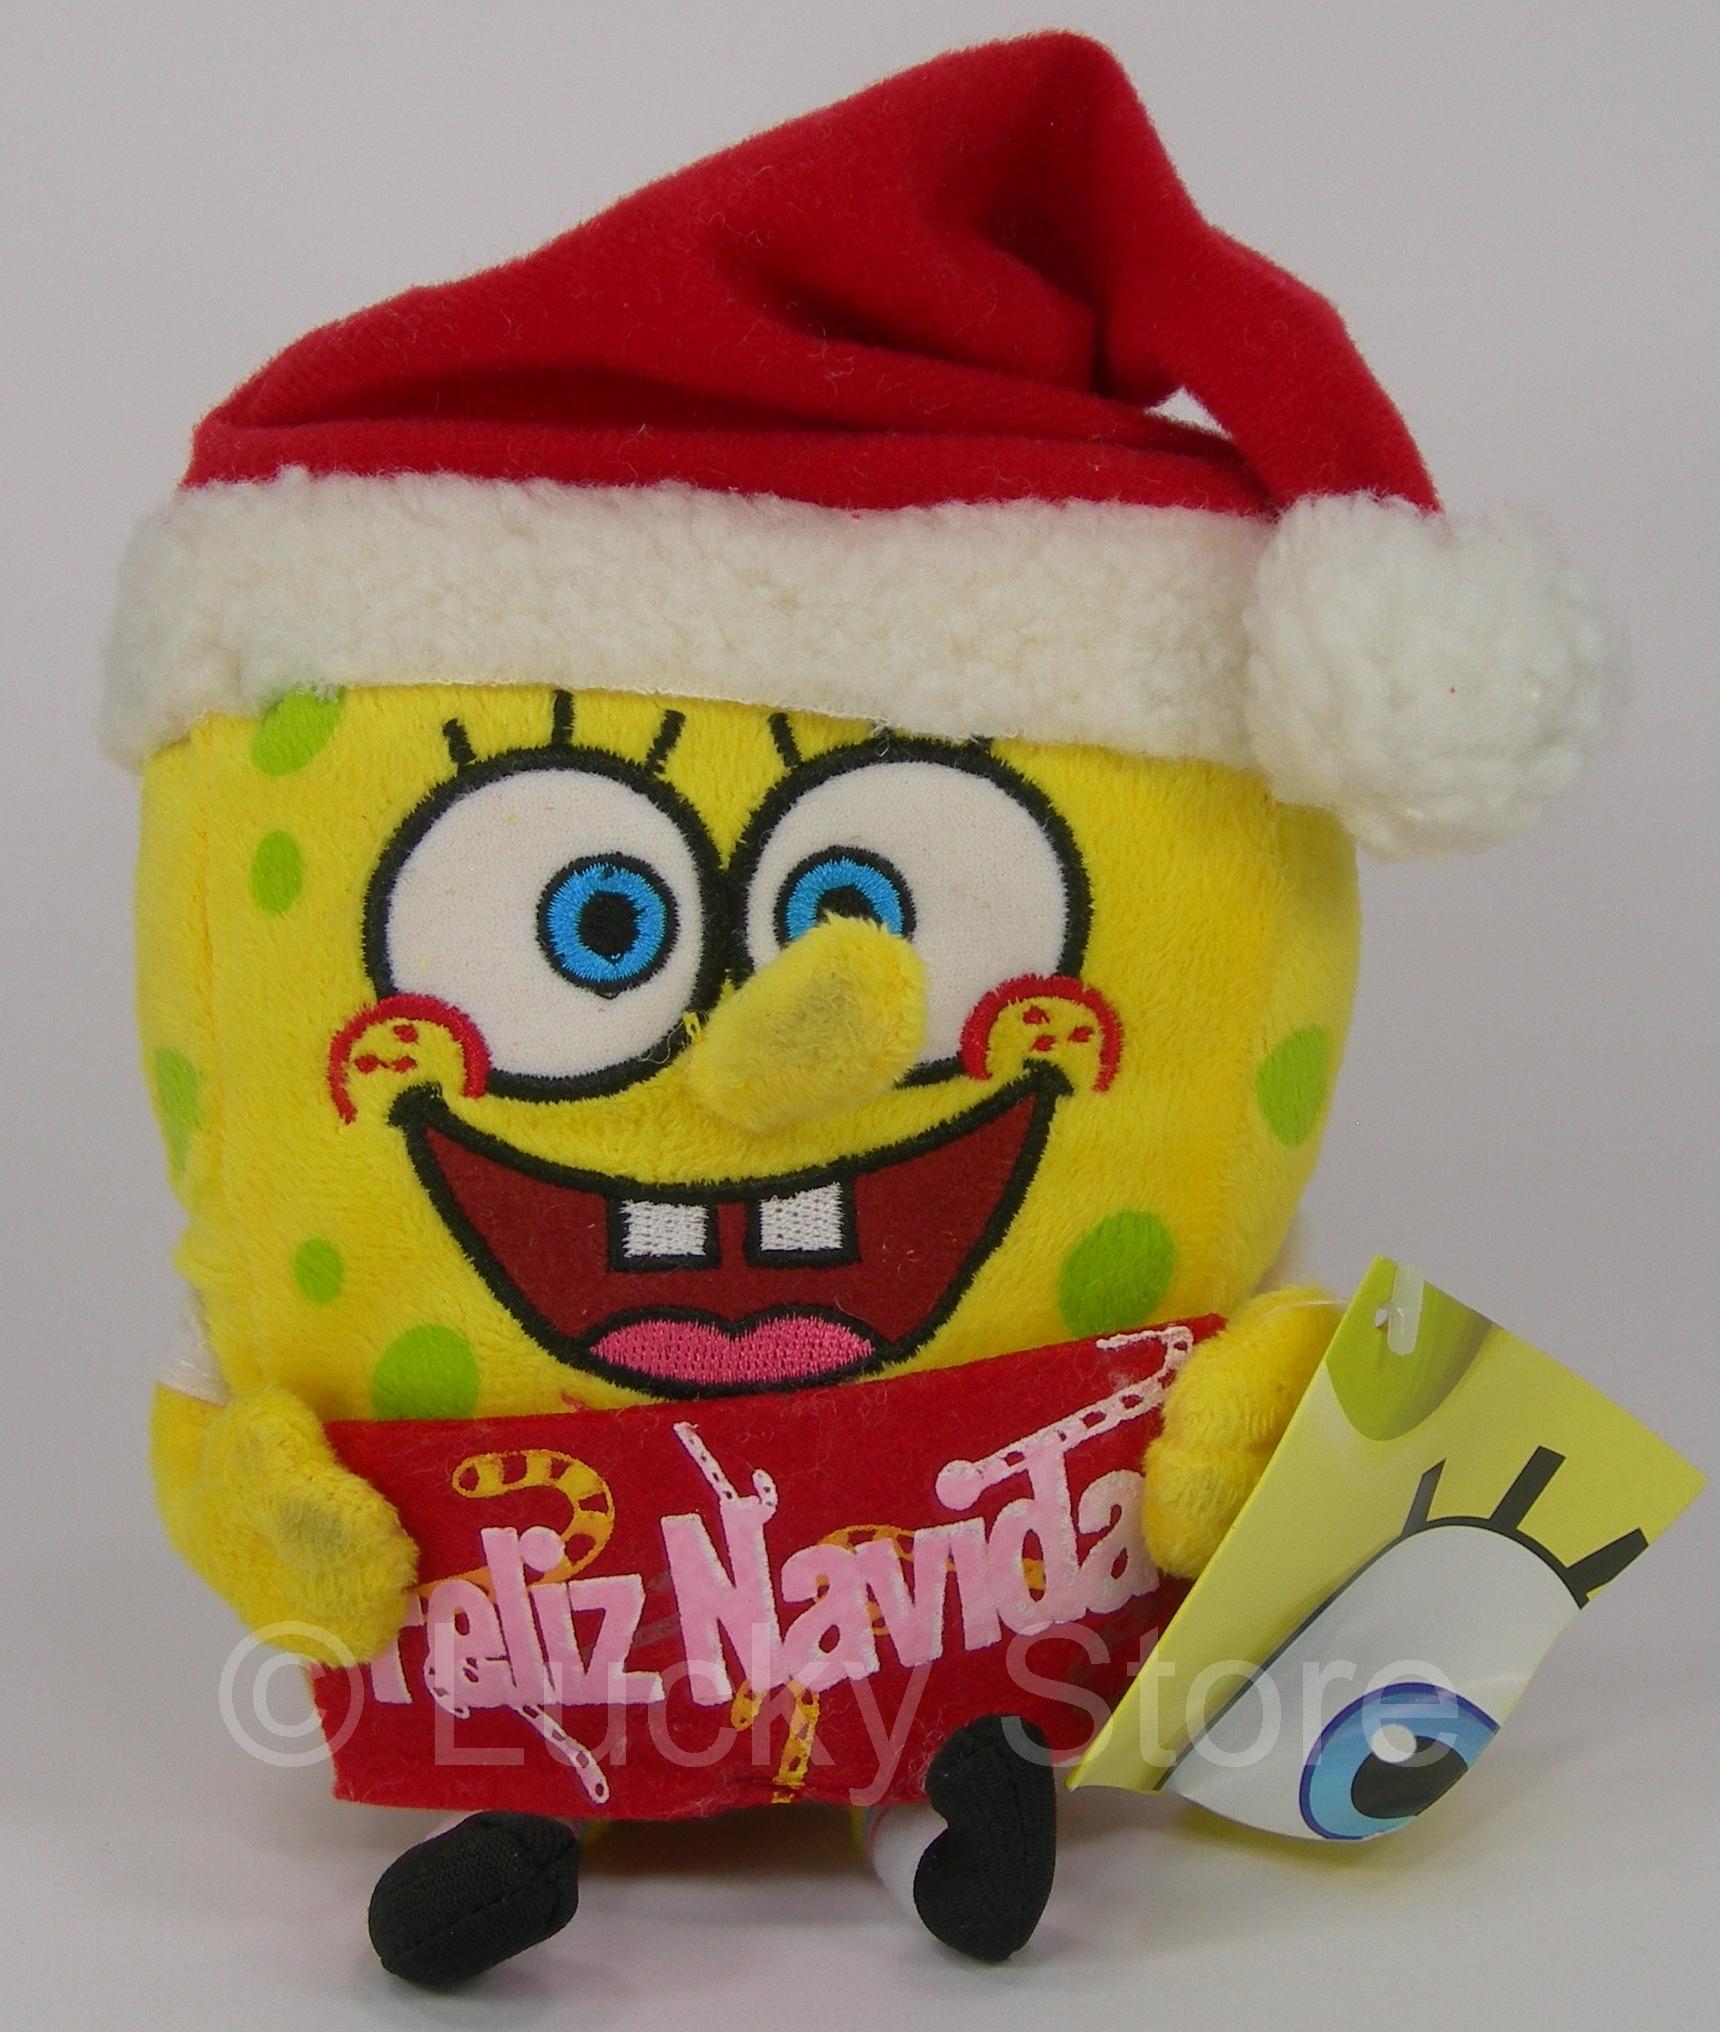 Spongebob Natale peluche 20 cm con ventosa Originale Squarepants